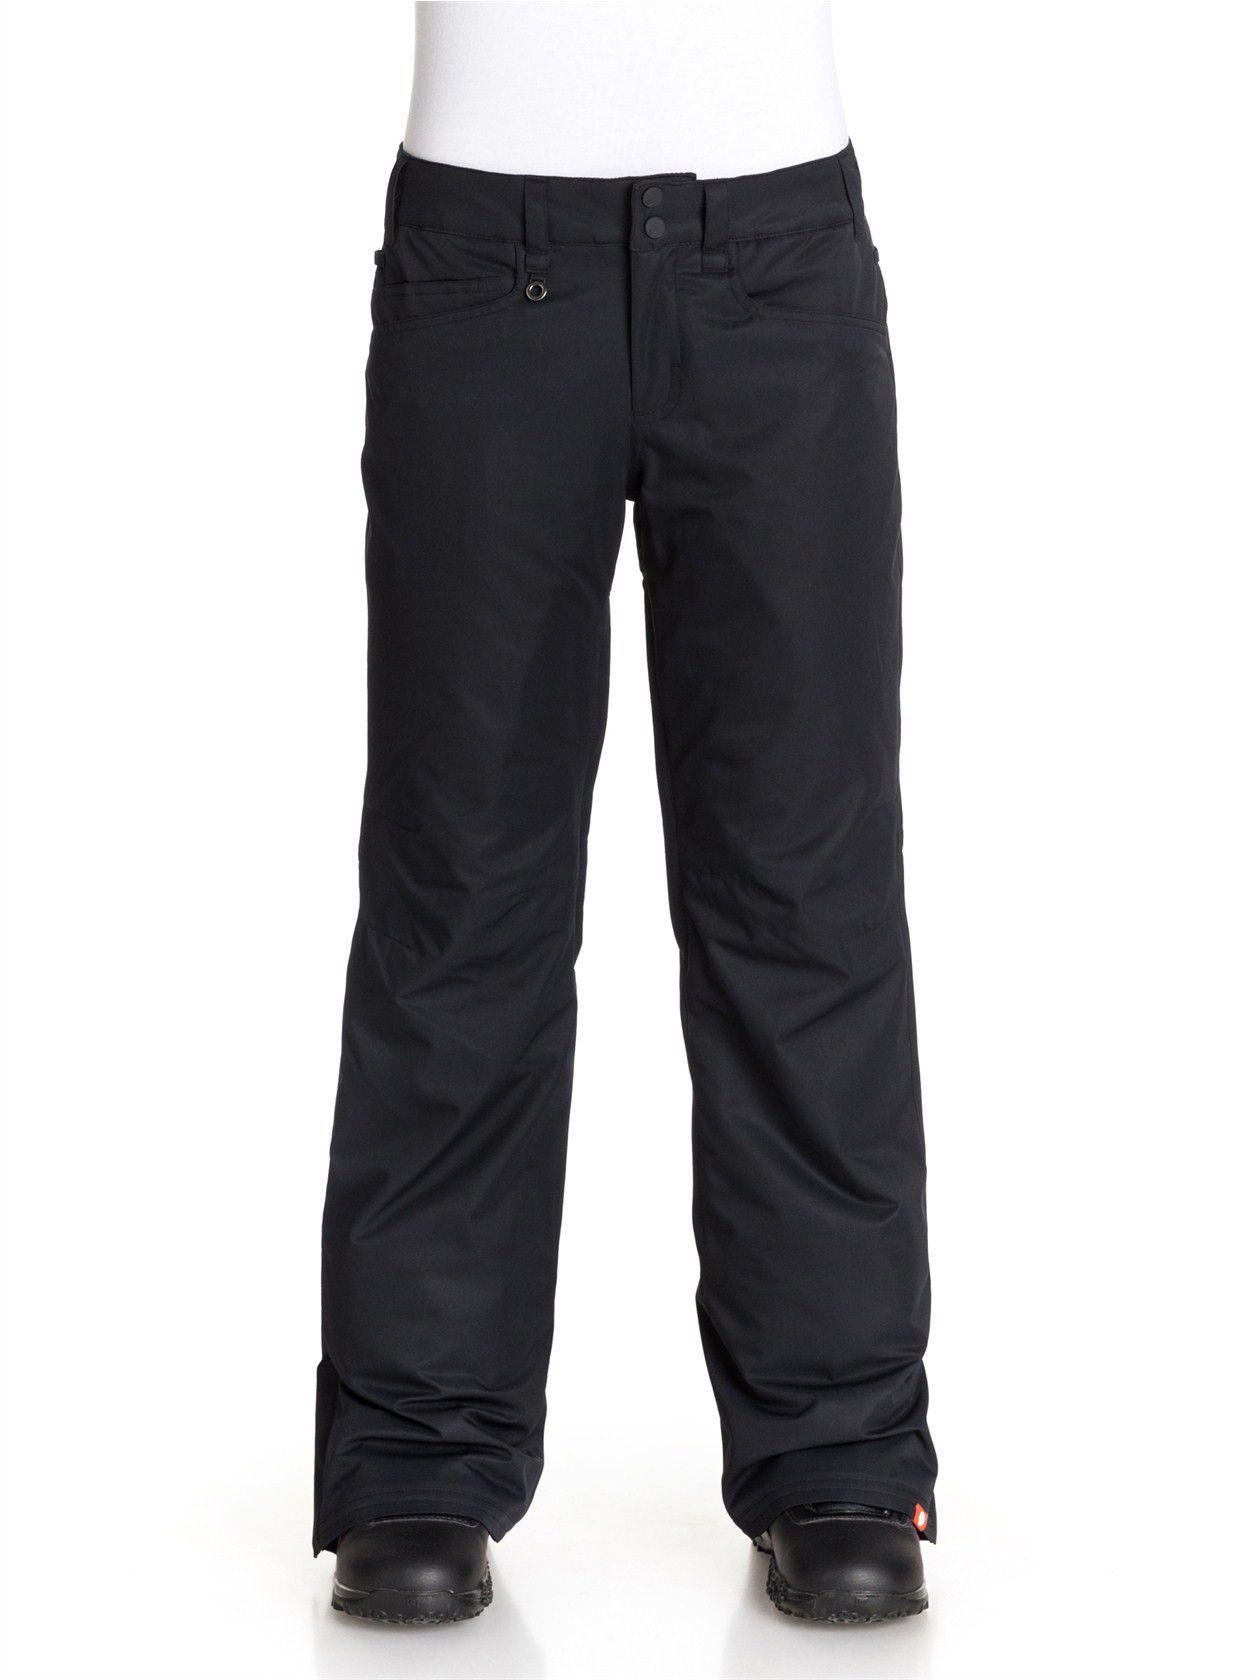 roxy backyard snowboard pants womens products snowboard pants